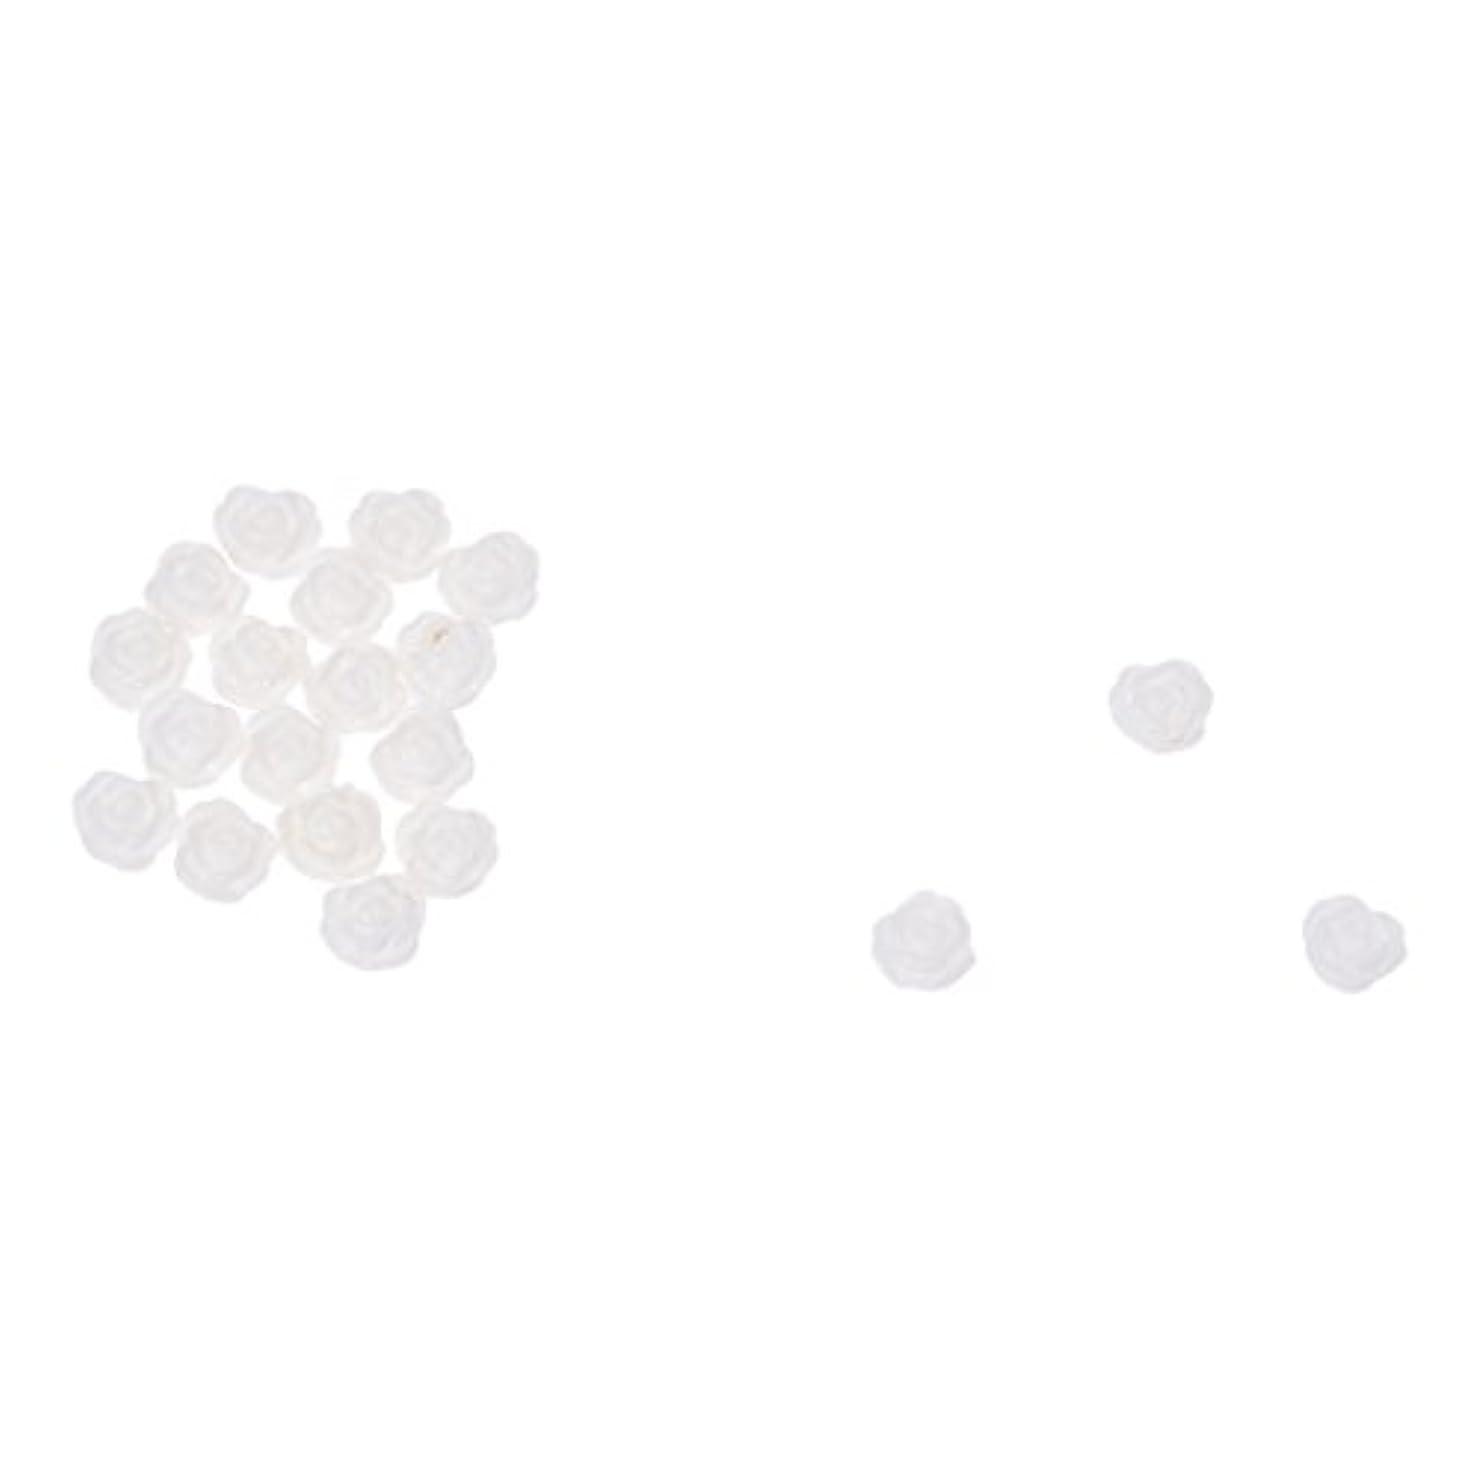 ACAMPTAR ACAMPTAR(R)20×アクリル 3D 白い花 スライスネイルアートヒント UVジェル DIYデコレーション